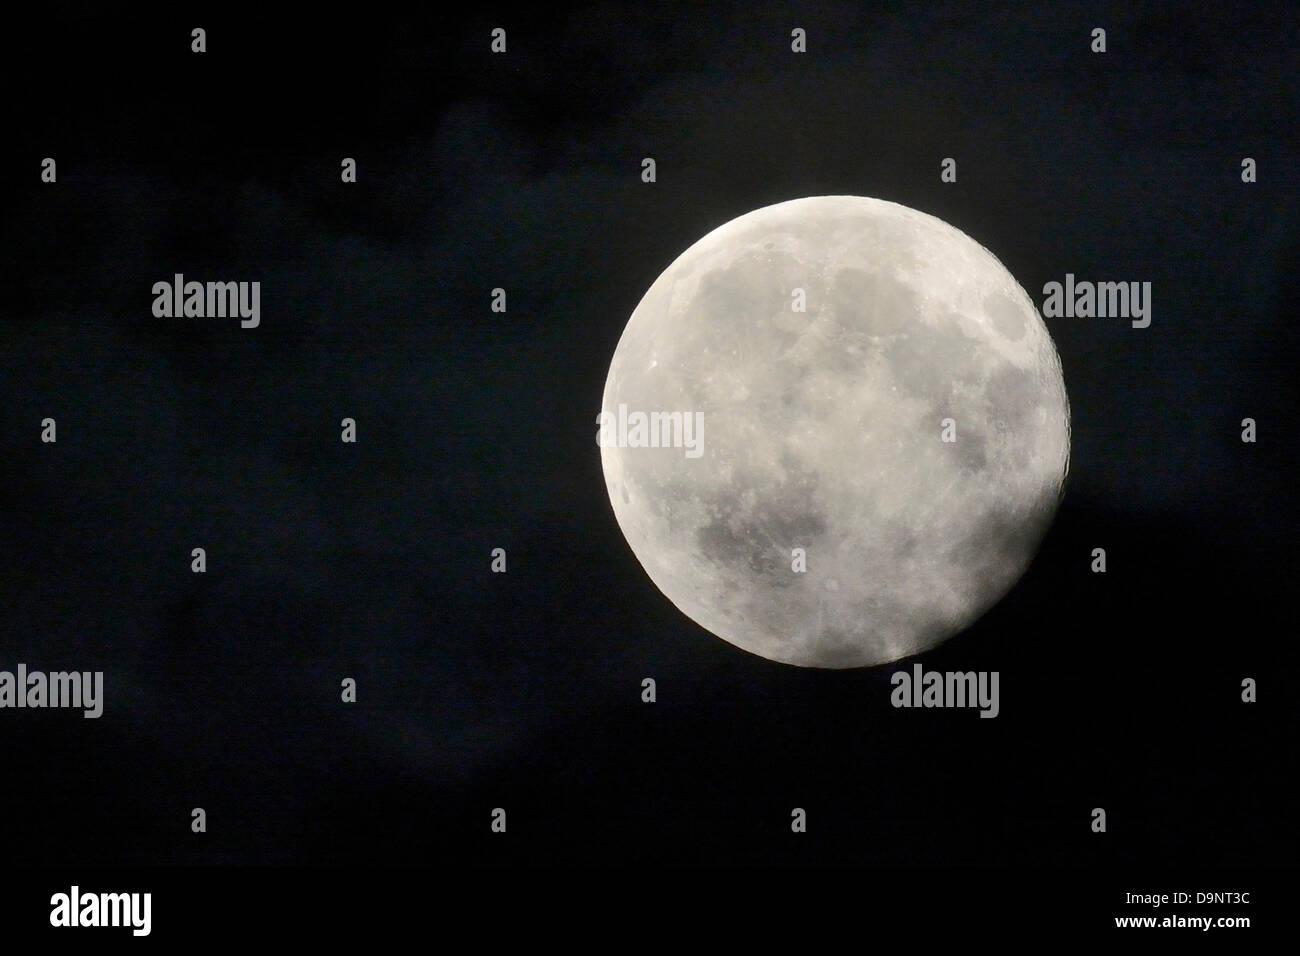 Toronto Canada June 23 2013 Supermoon Perigee Full Moon The